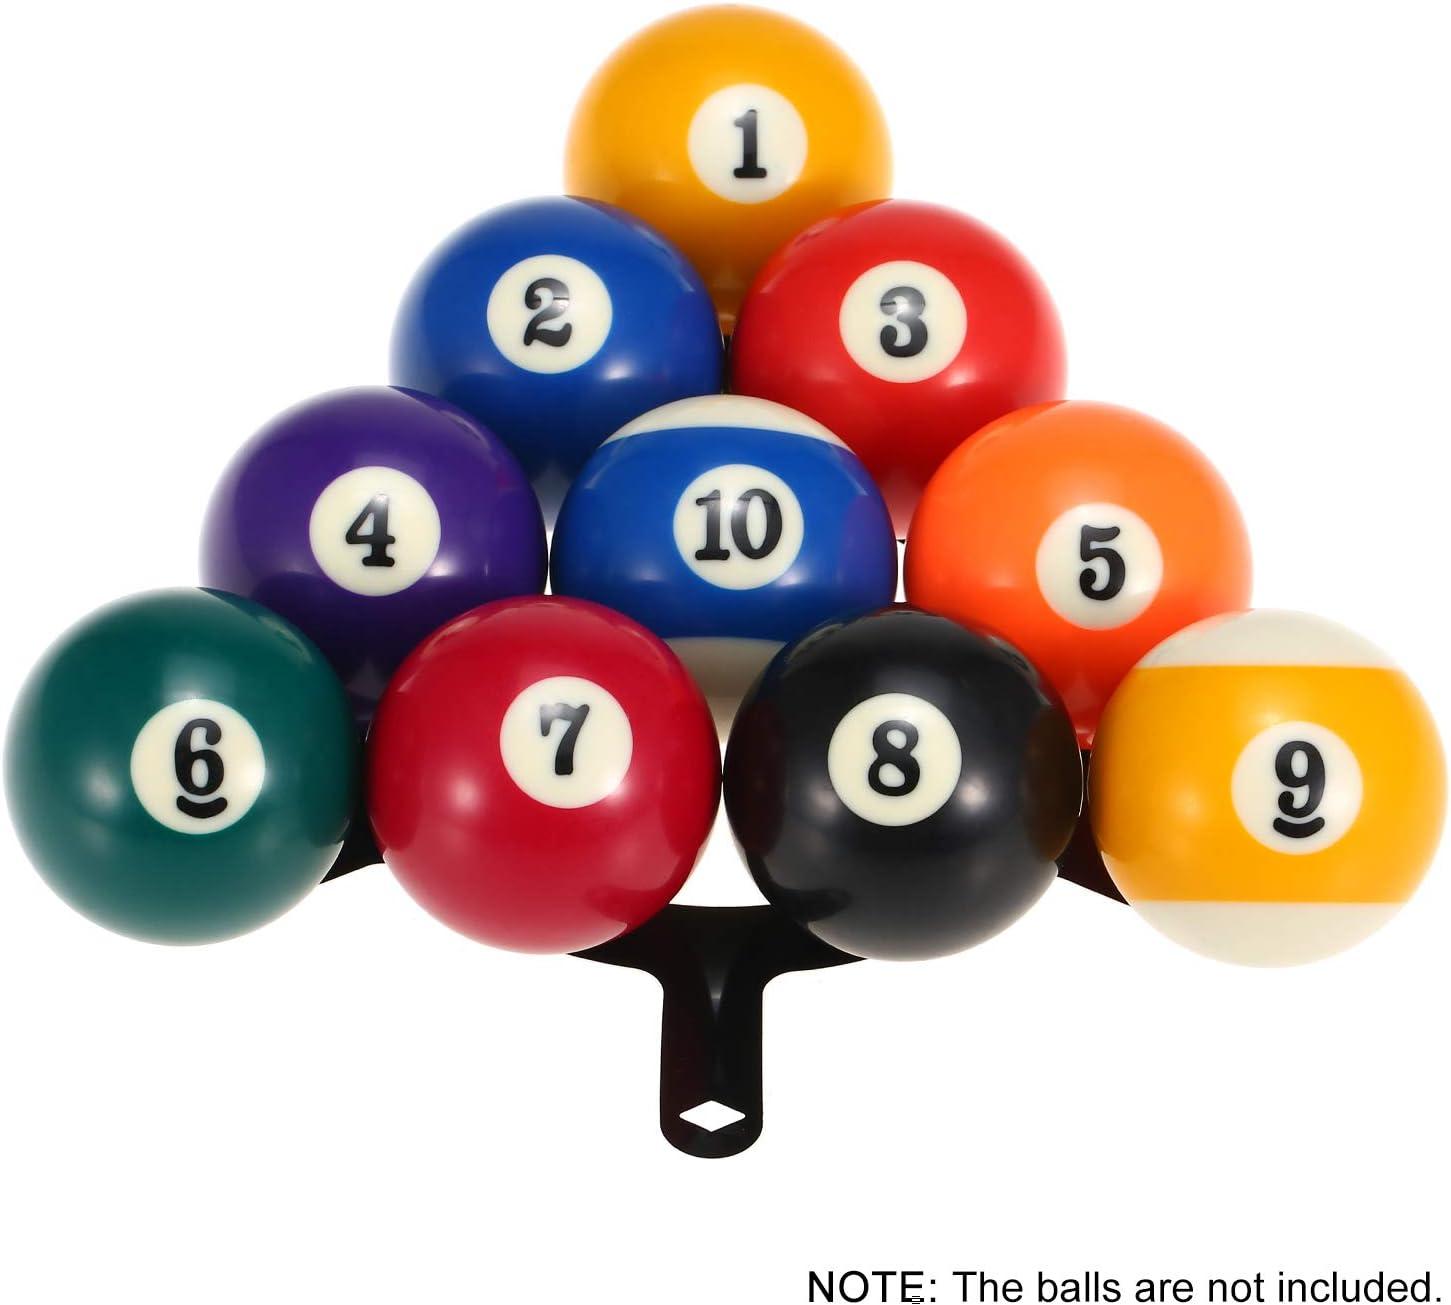 Ajcoflt 6 PCS Ball Rack Billar Rack Sheet Cue Ball Rack Cue Ball Accesorio: Amazon.es: Jardín